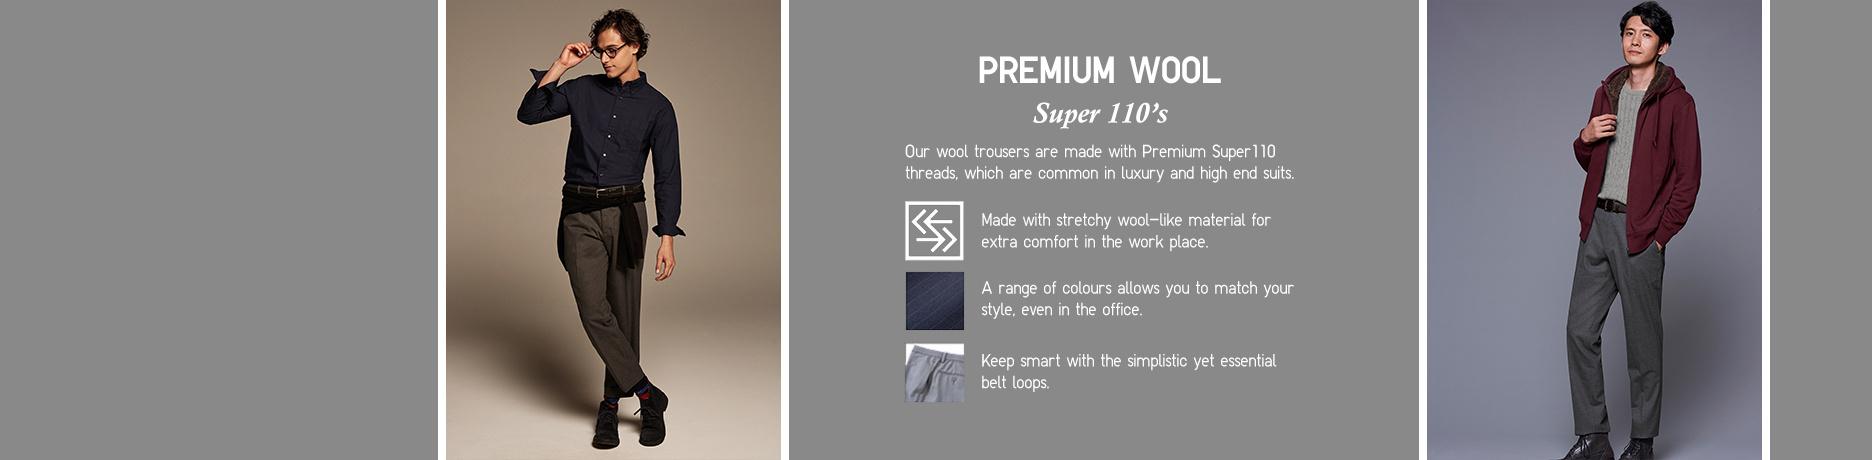 Premiumwolle